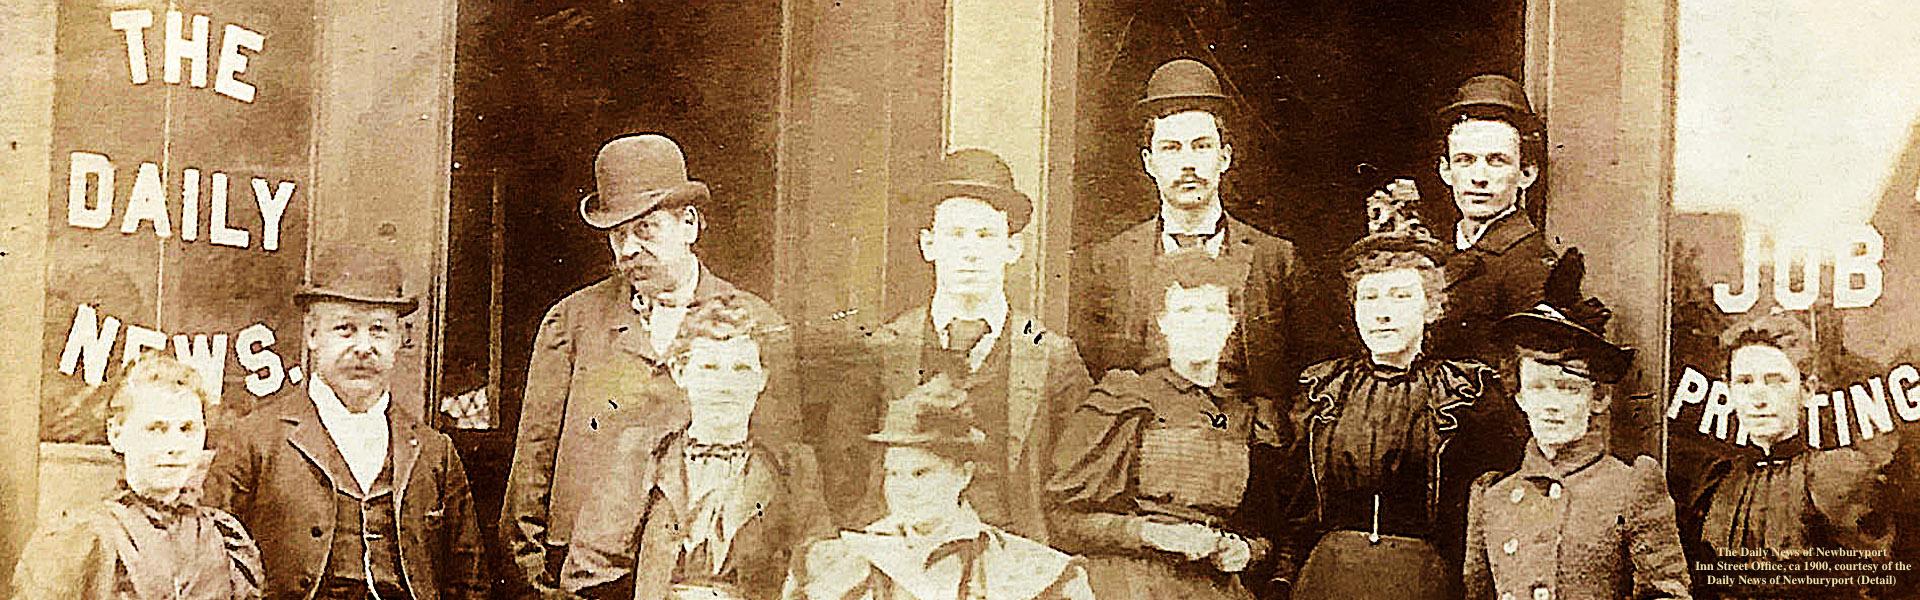 The Daily News Office 1900 Newburyport MA